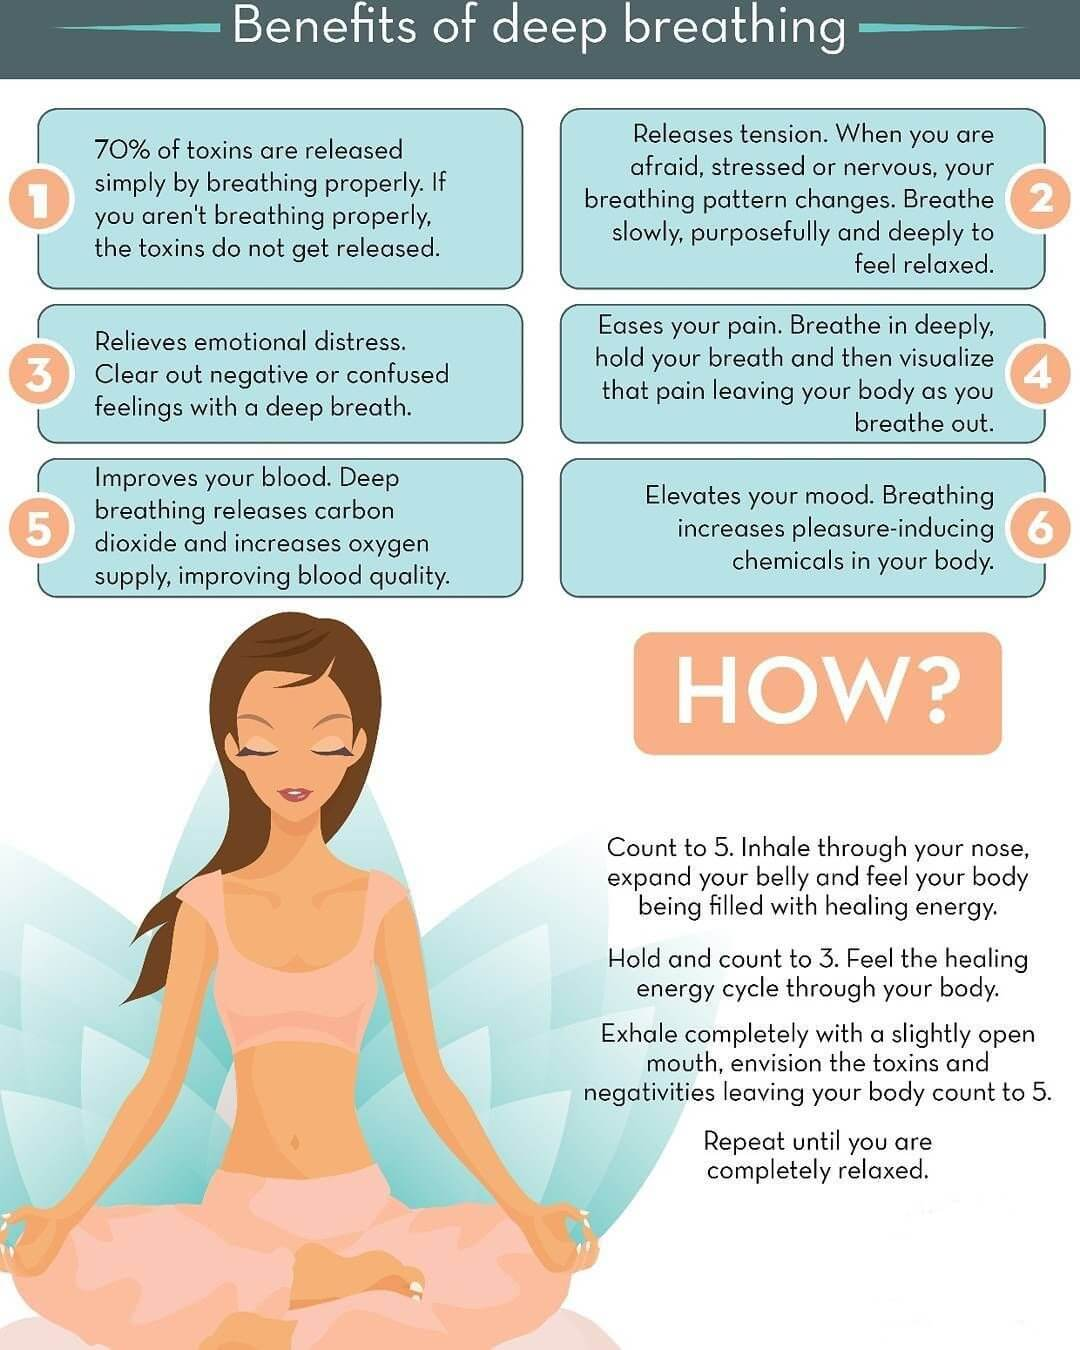 List of benefits of deep breathing